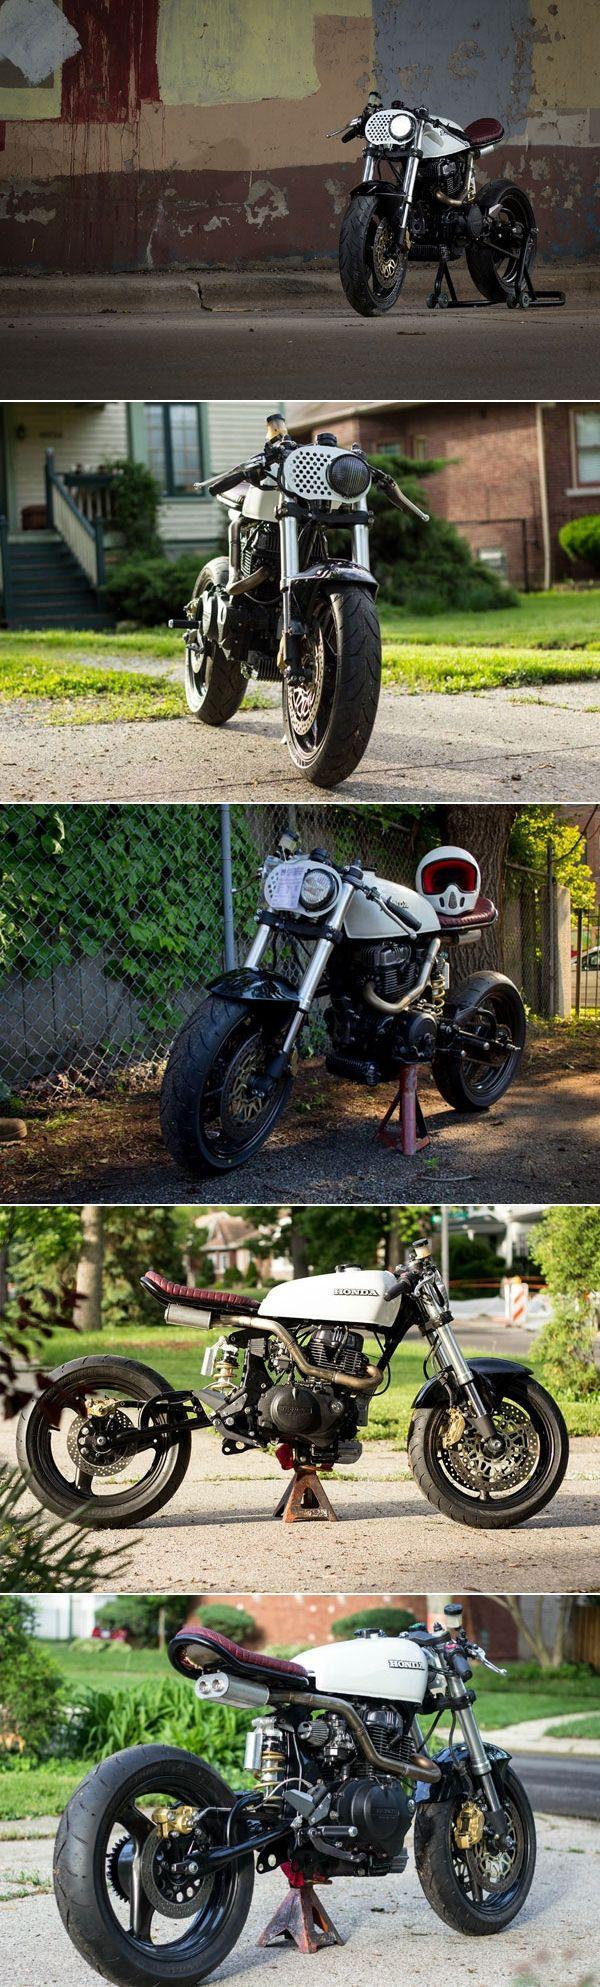 Honda 450 Cafe Racer #motorcycles #caferacer #motos | caferacerpasion.com